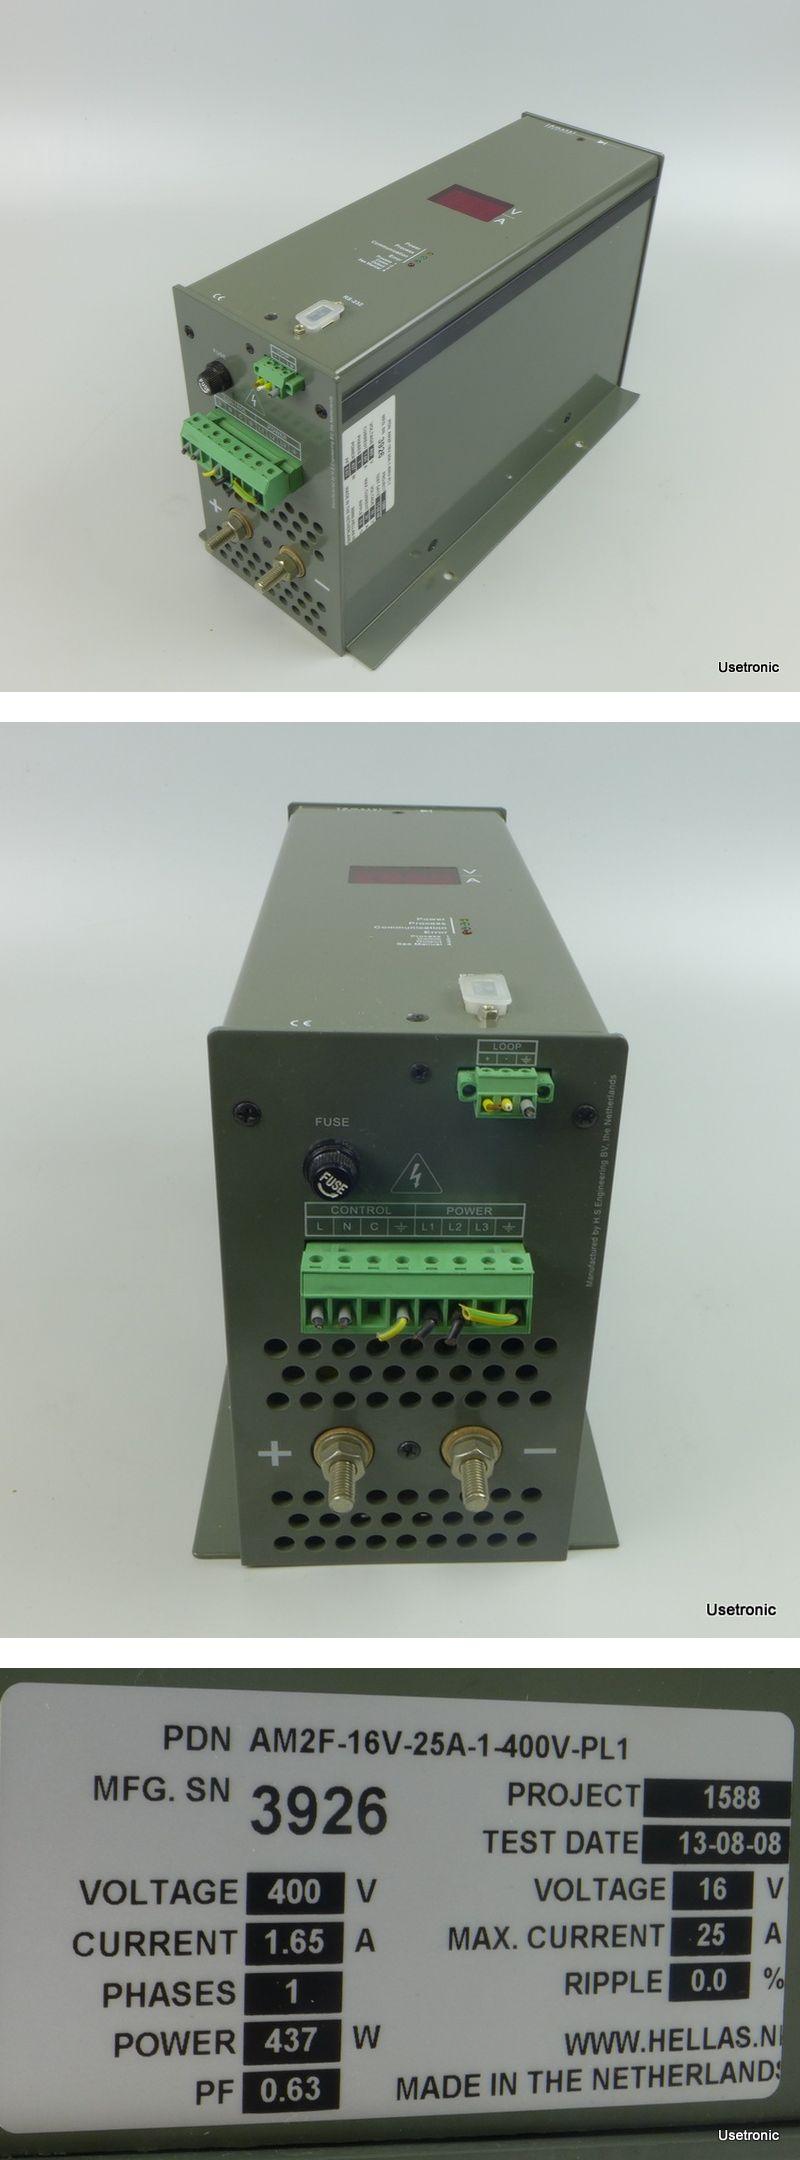 Amstel PDN AM2F-16V-25A-1-400V-PL1